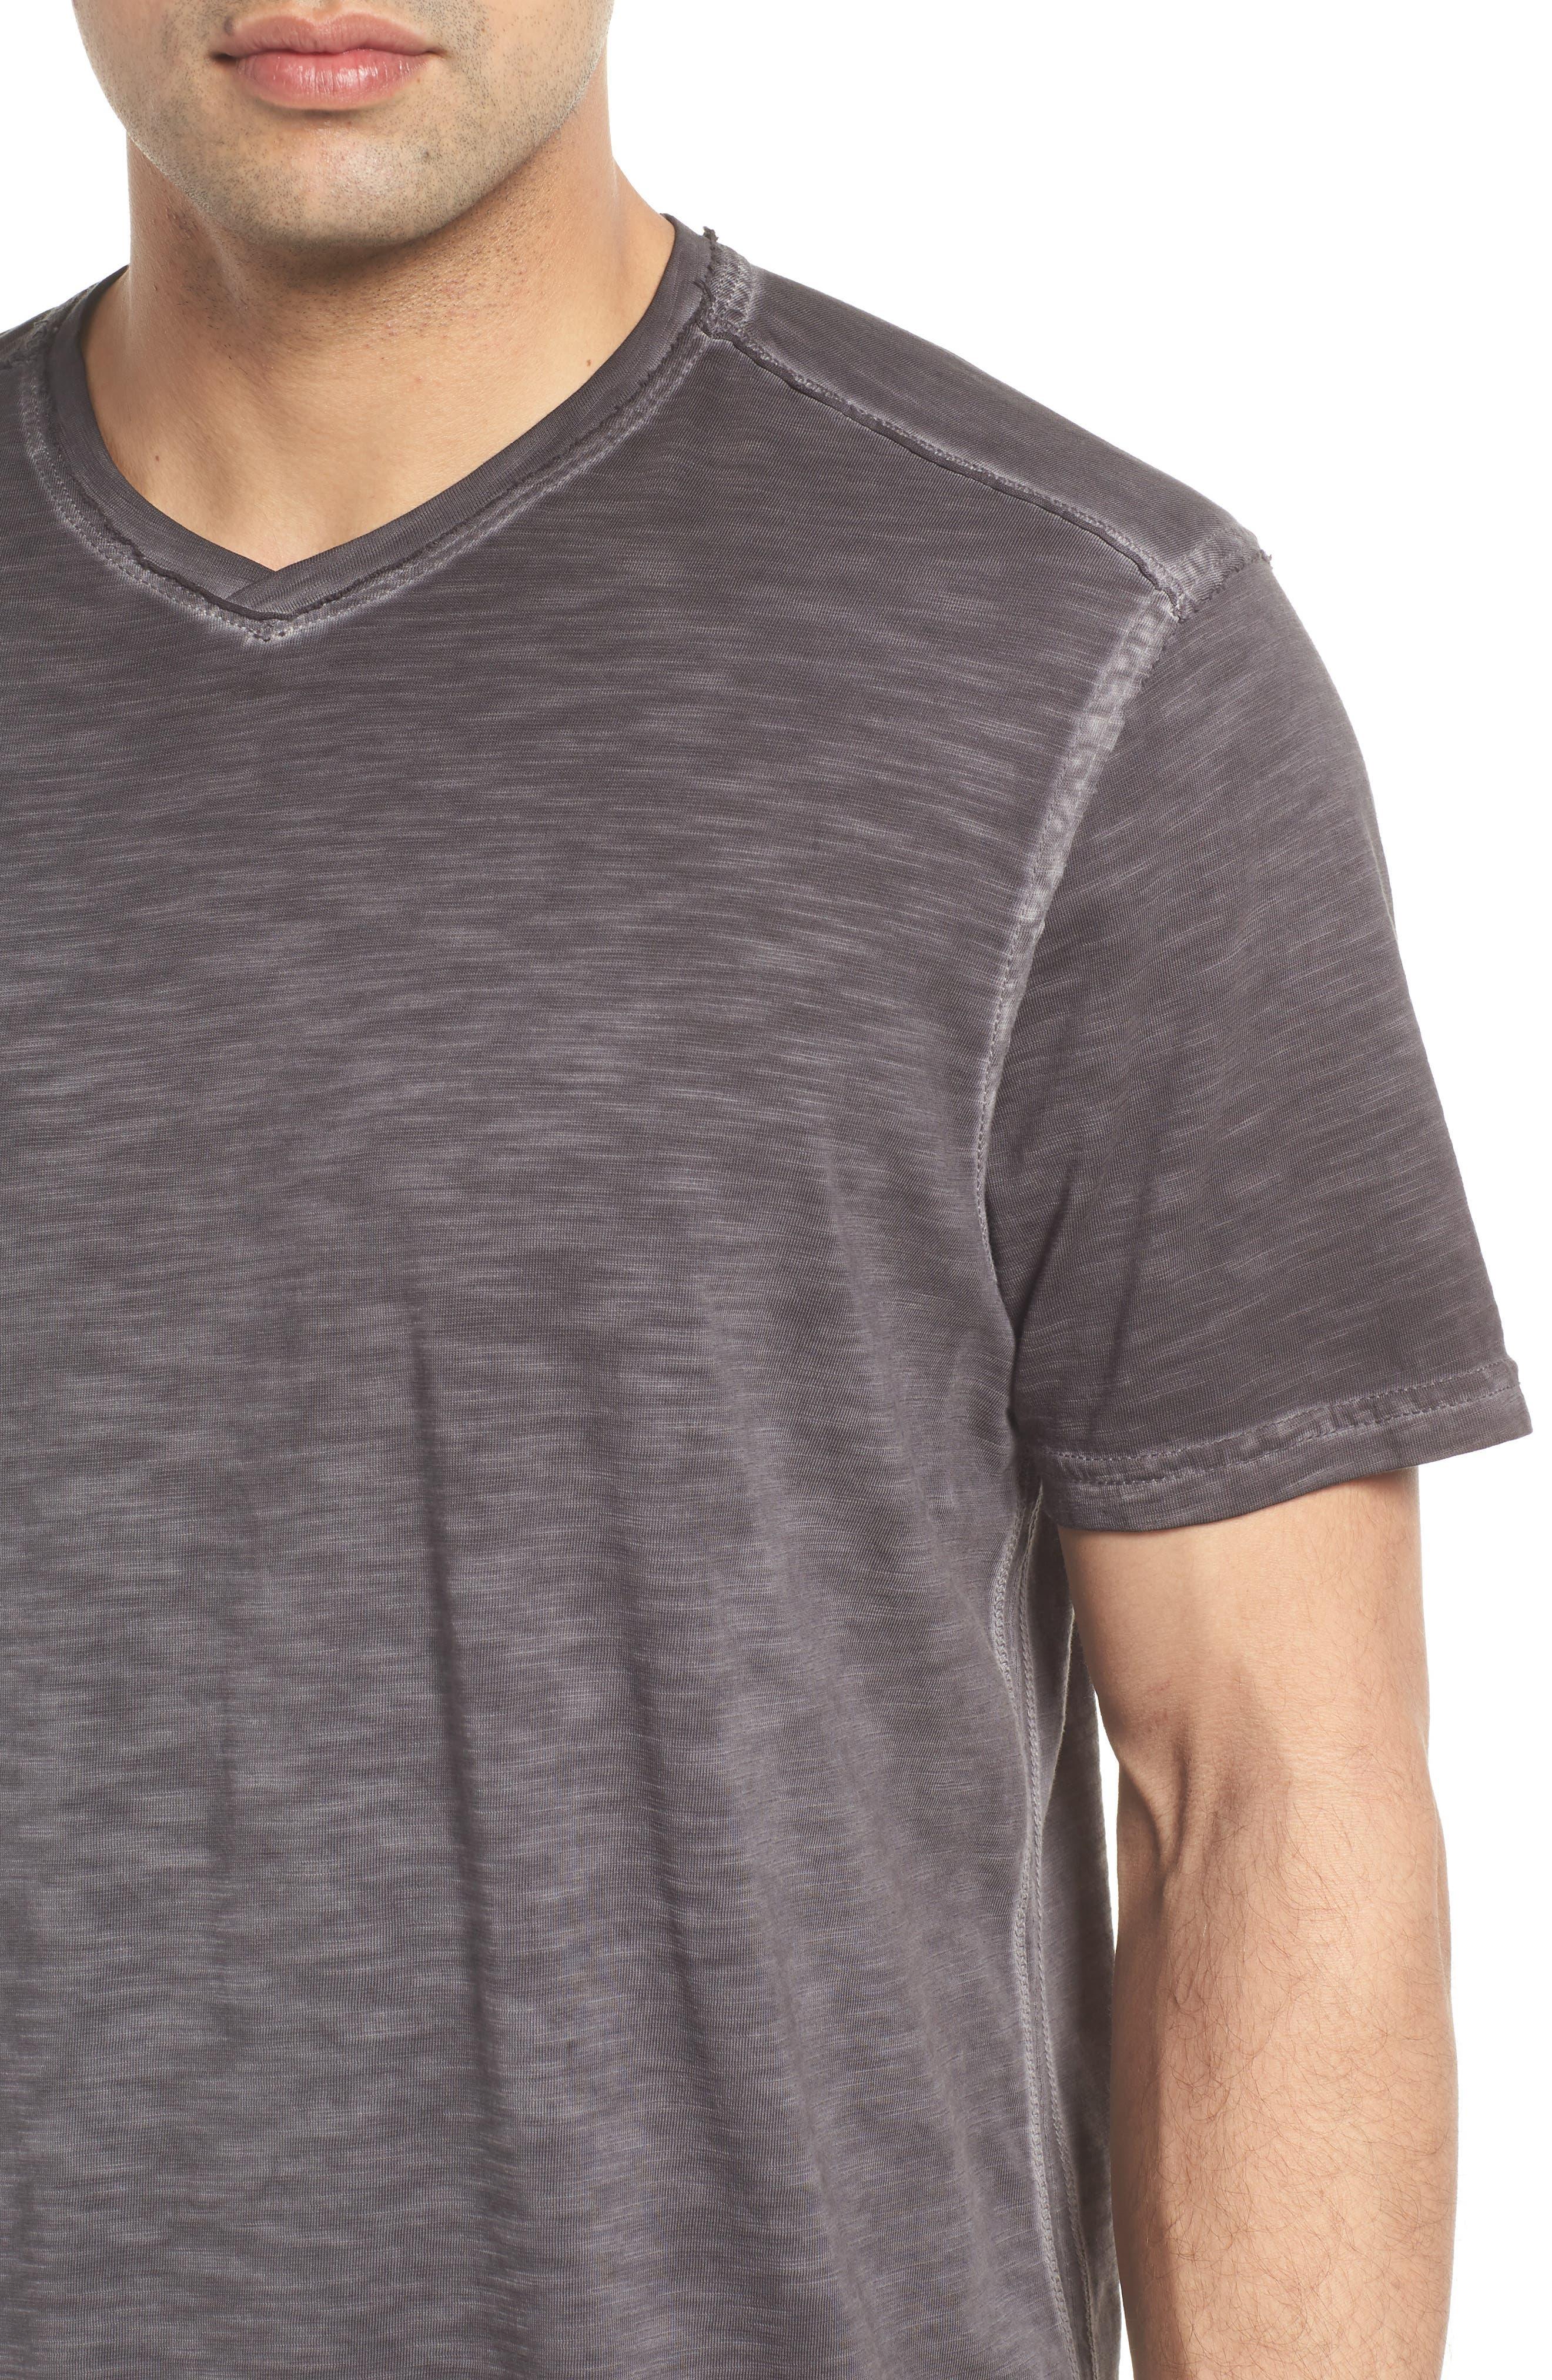 Suncoast Shores V-Neck T-Shirt,                             Alternate thumbnail 4, color,                             COAL